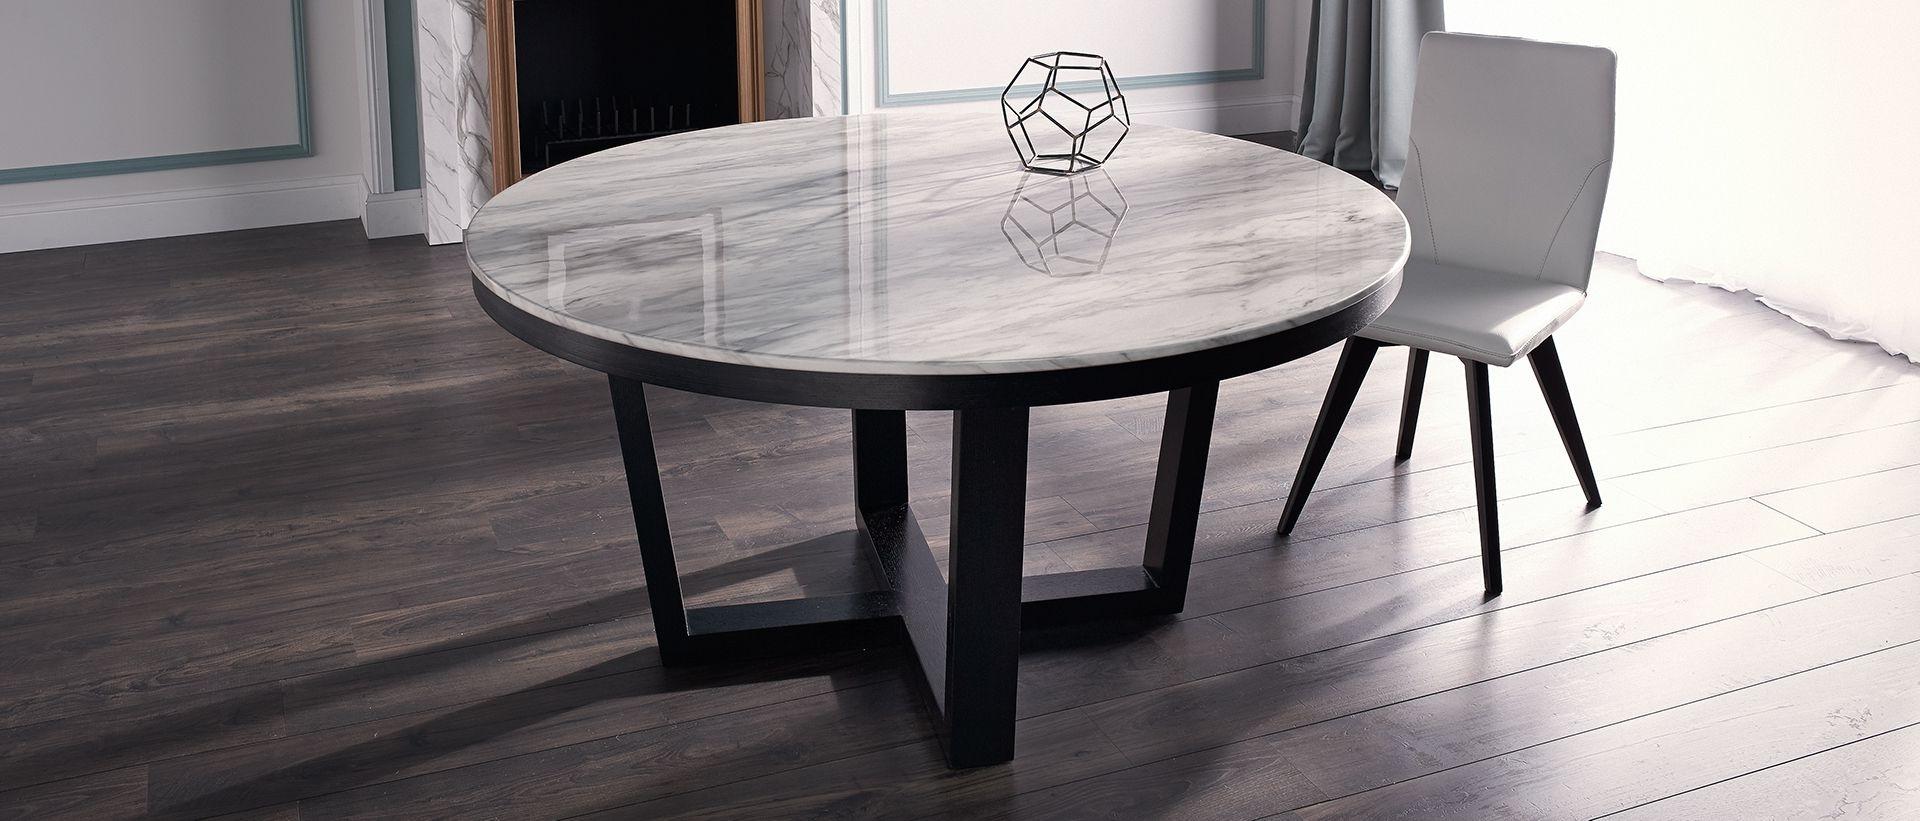 Nick Scali Furniture (View 13 of 25)